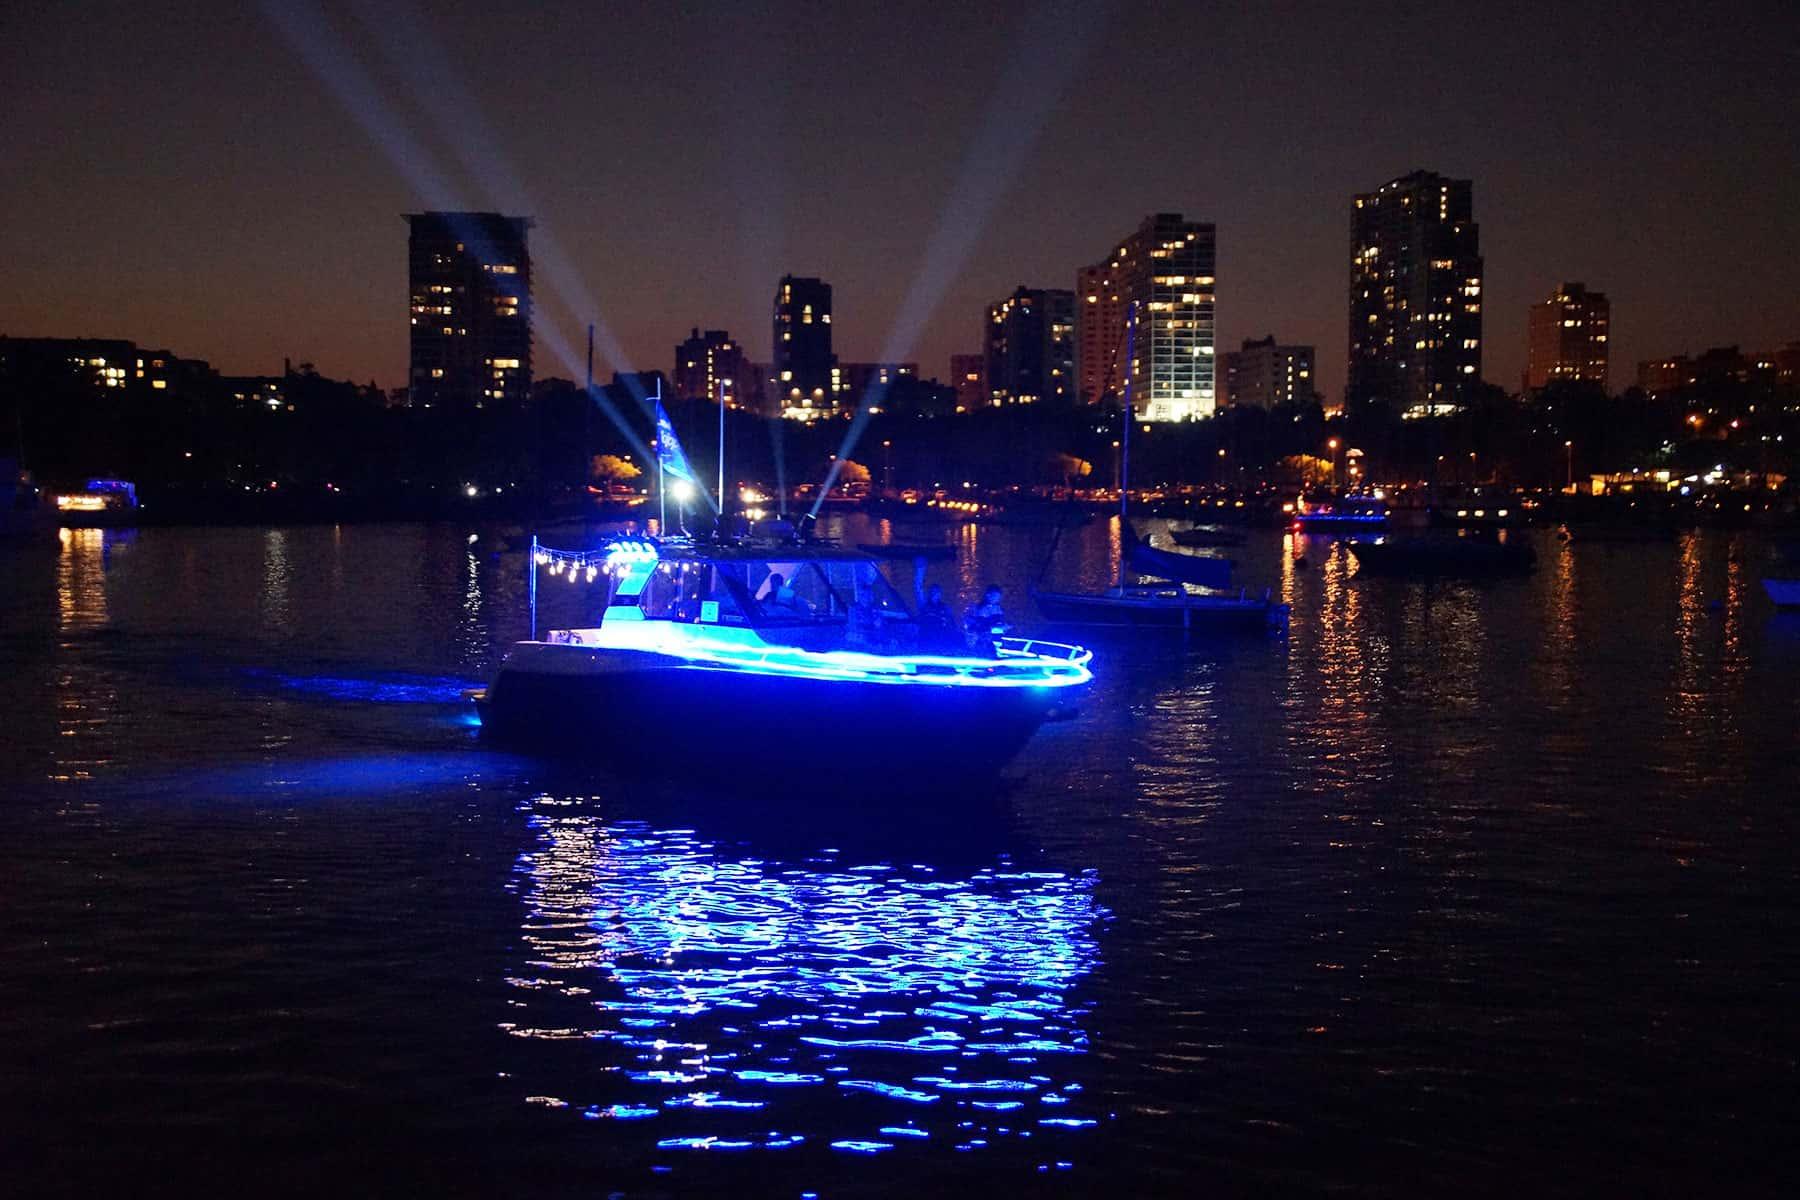 03_081917_venetianboatparade_289